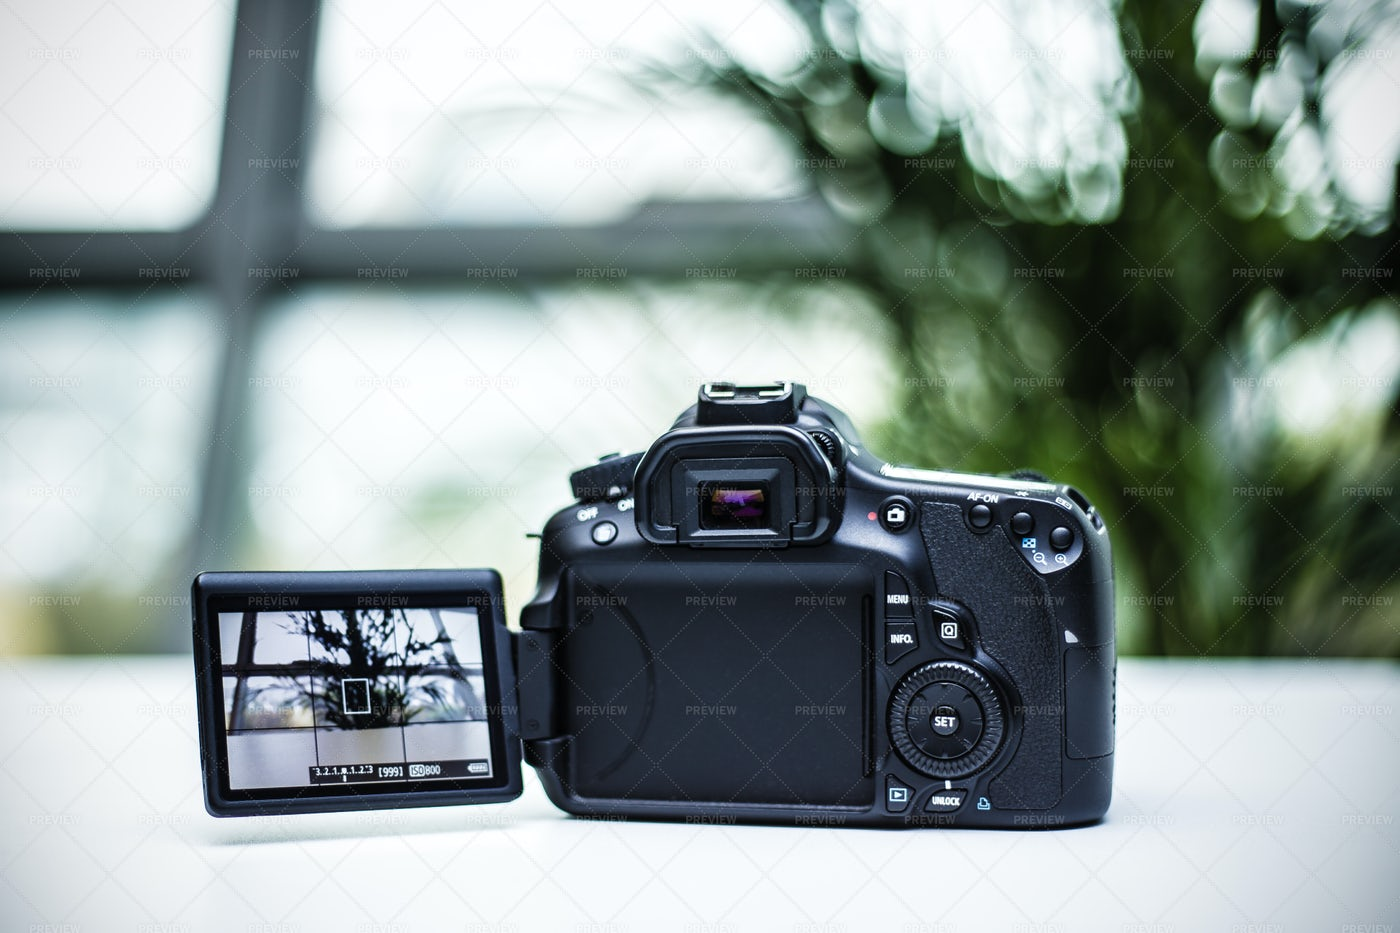 Screen Display On Digital Camera: Stock Photos